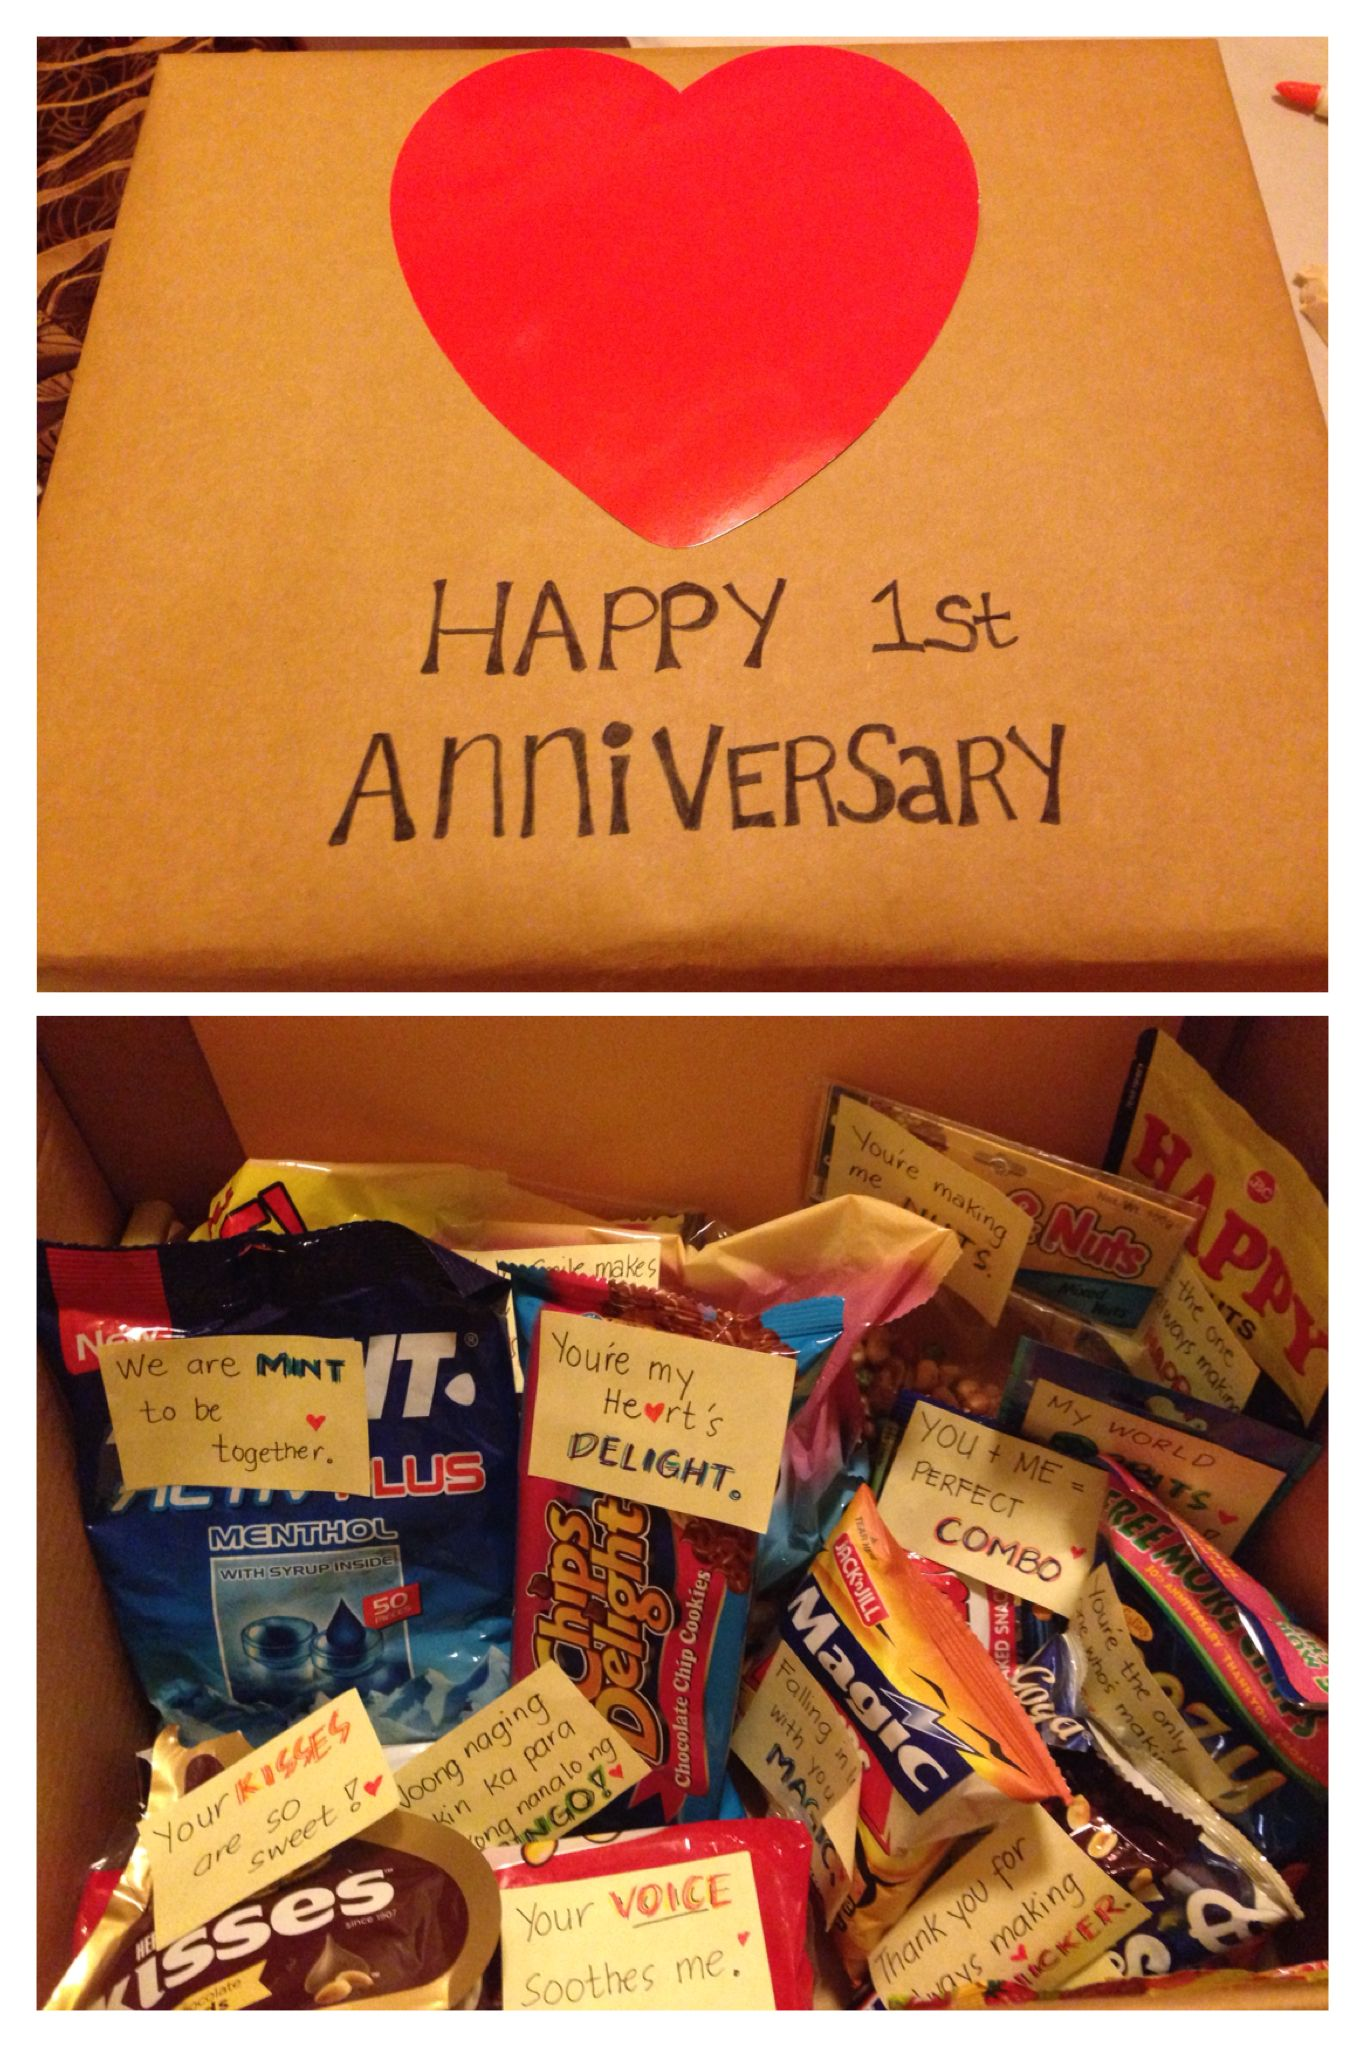 My First Anniversary Gift to my boyfriend. | Sweet ...